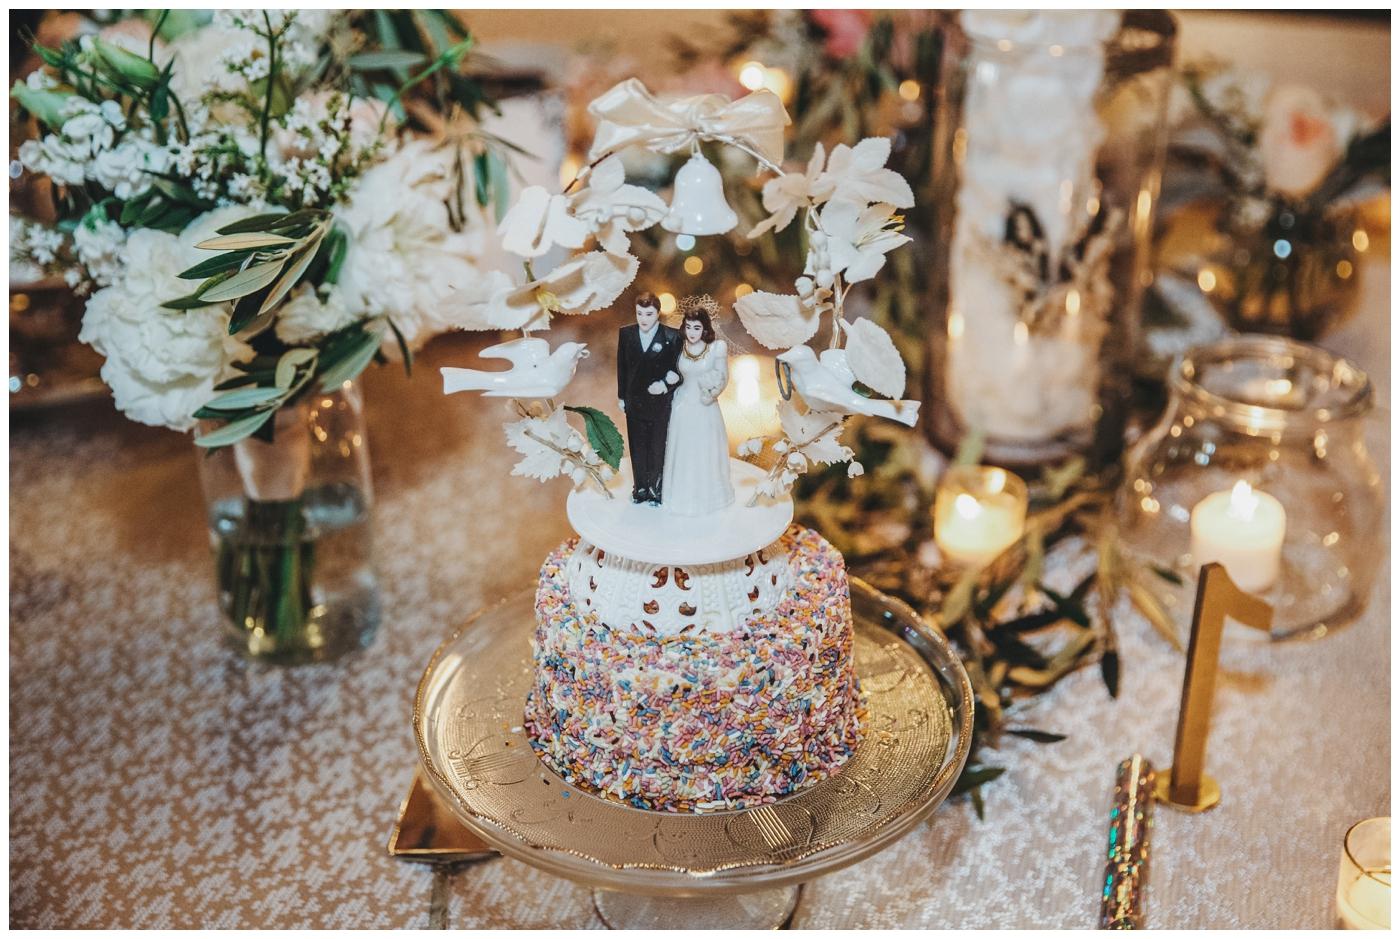 indianapolis_wedding_photographer-51.jpg